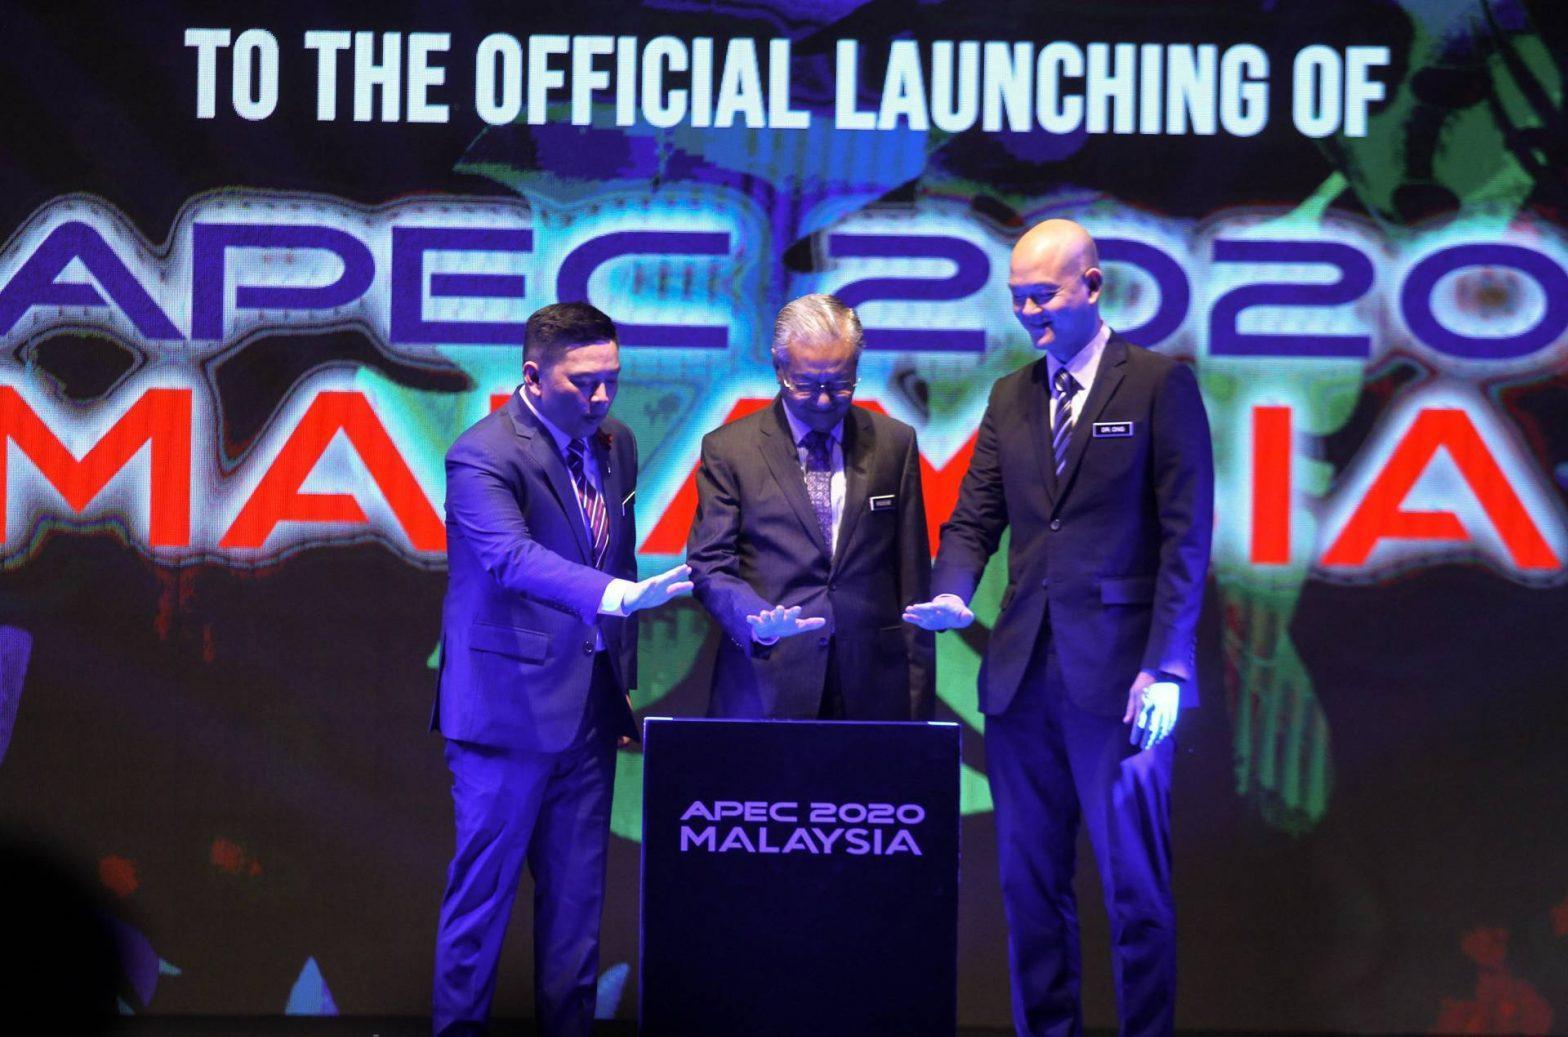 Malaysia hosted 2020 APEC Summit_40.1